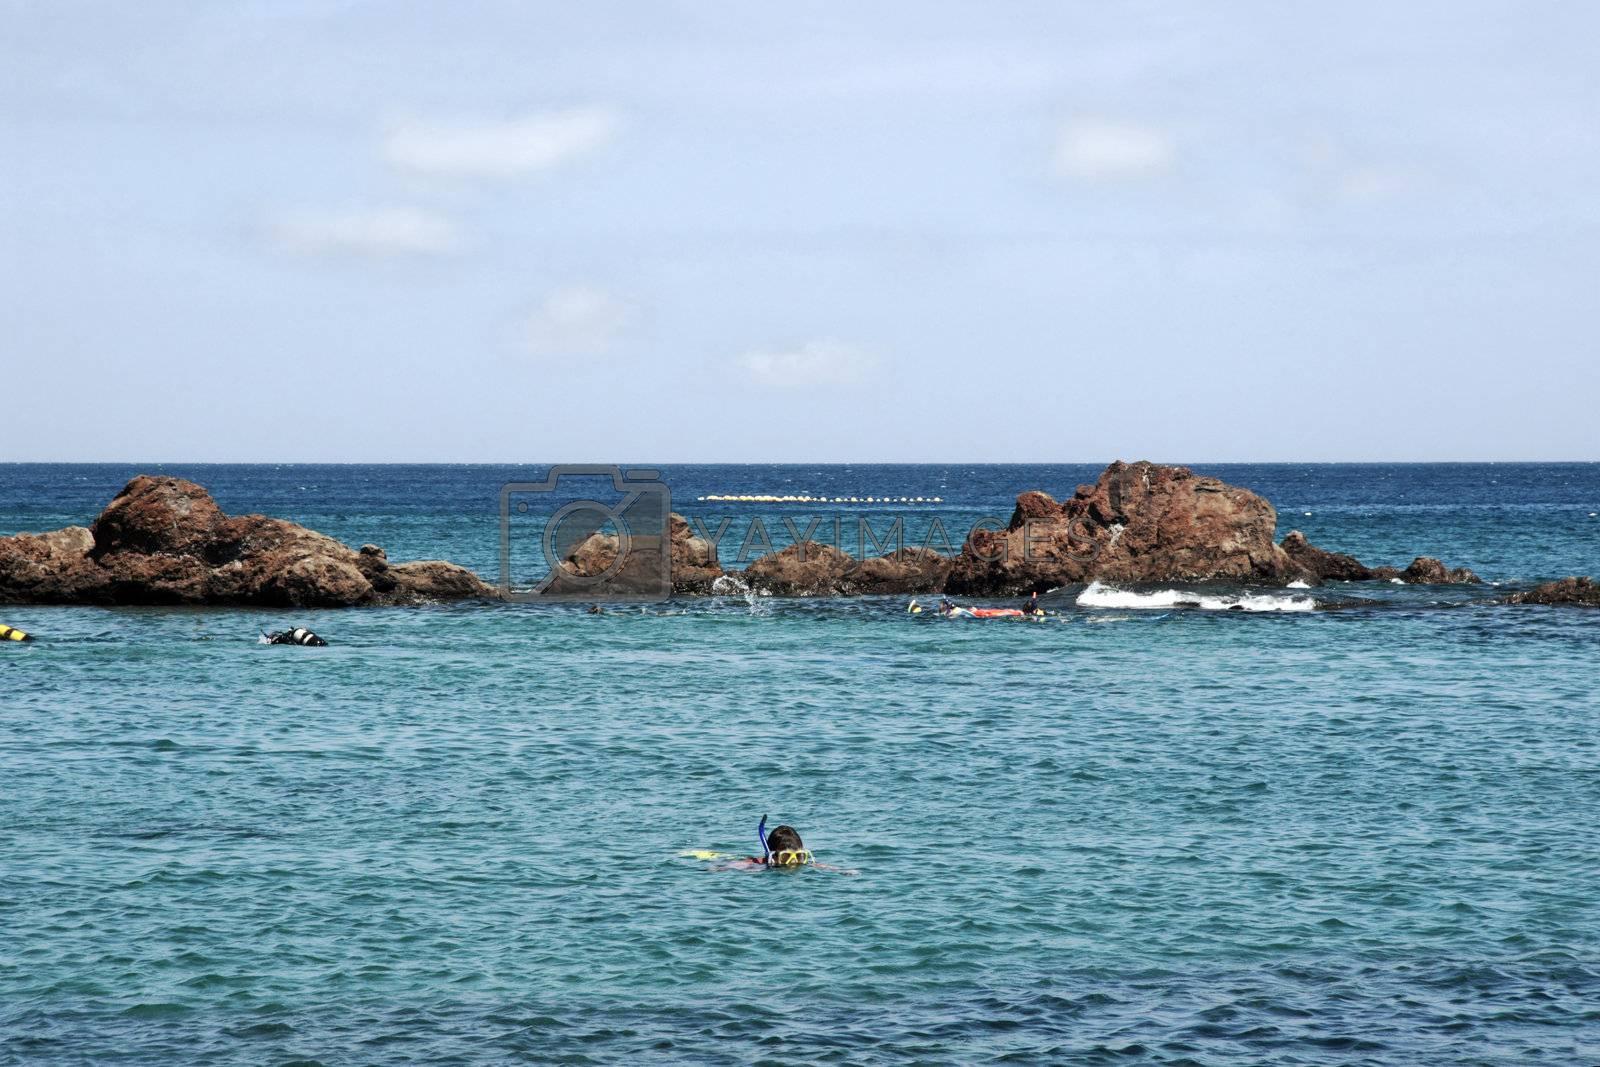 scuba divers by morrbyte